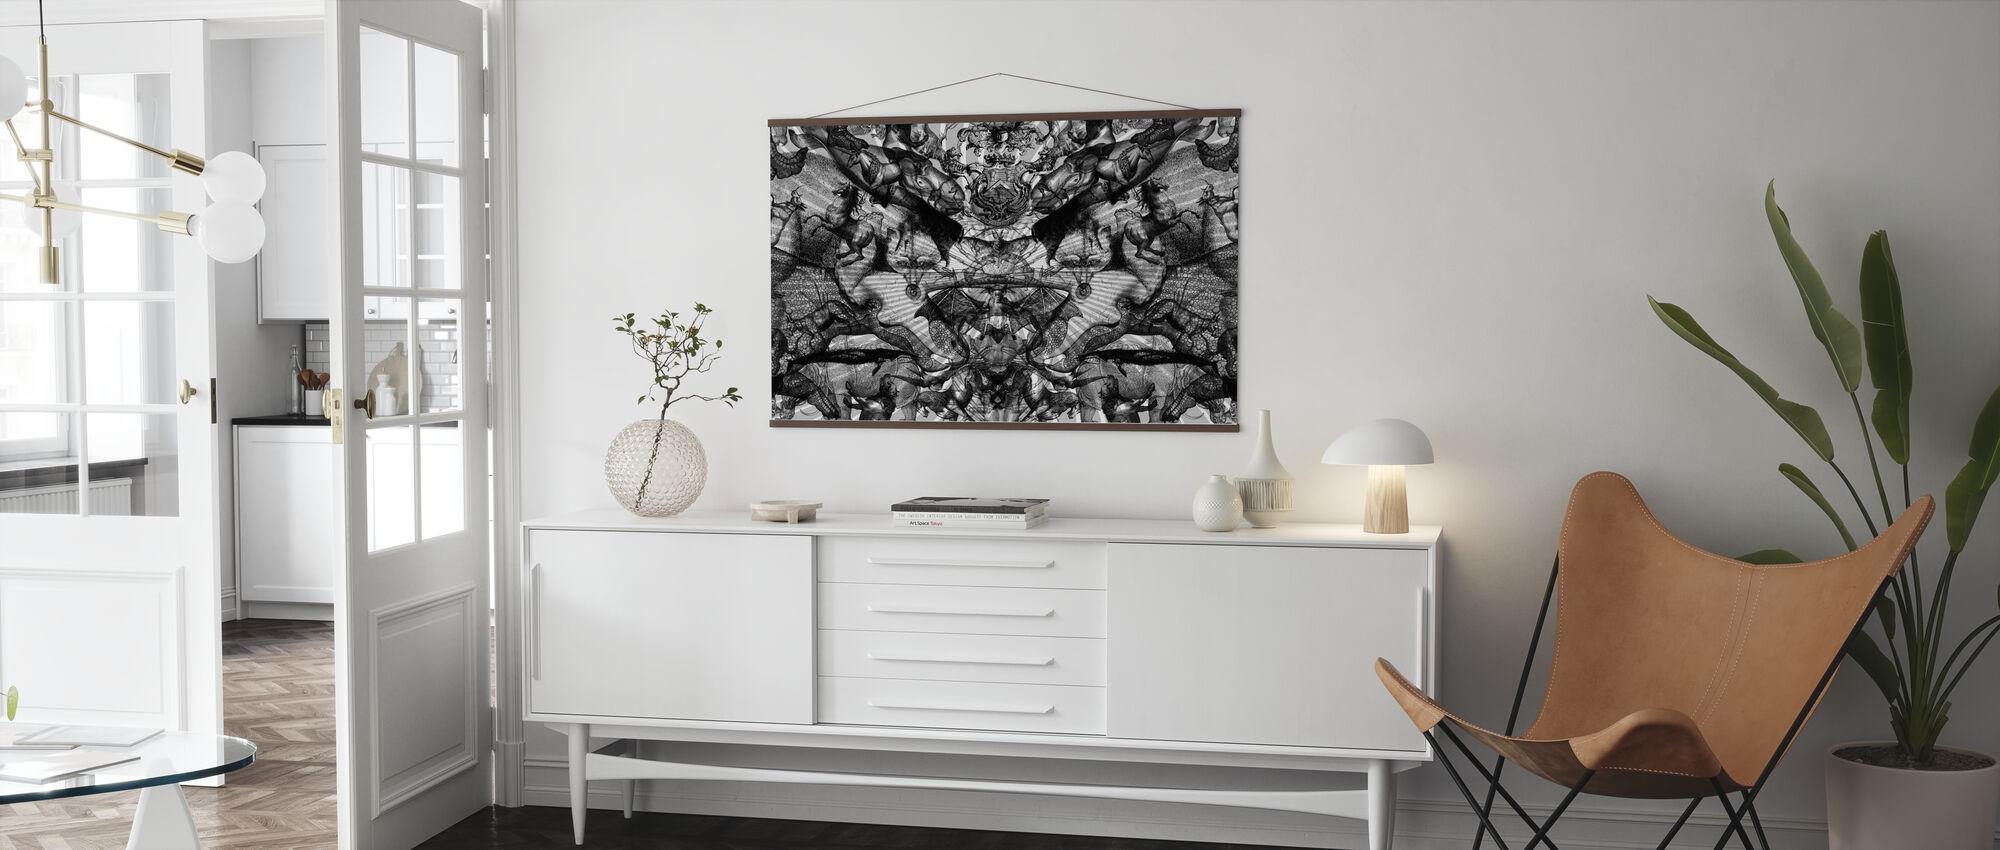 Horschach Circus - Poster - Living Room